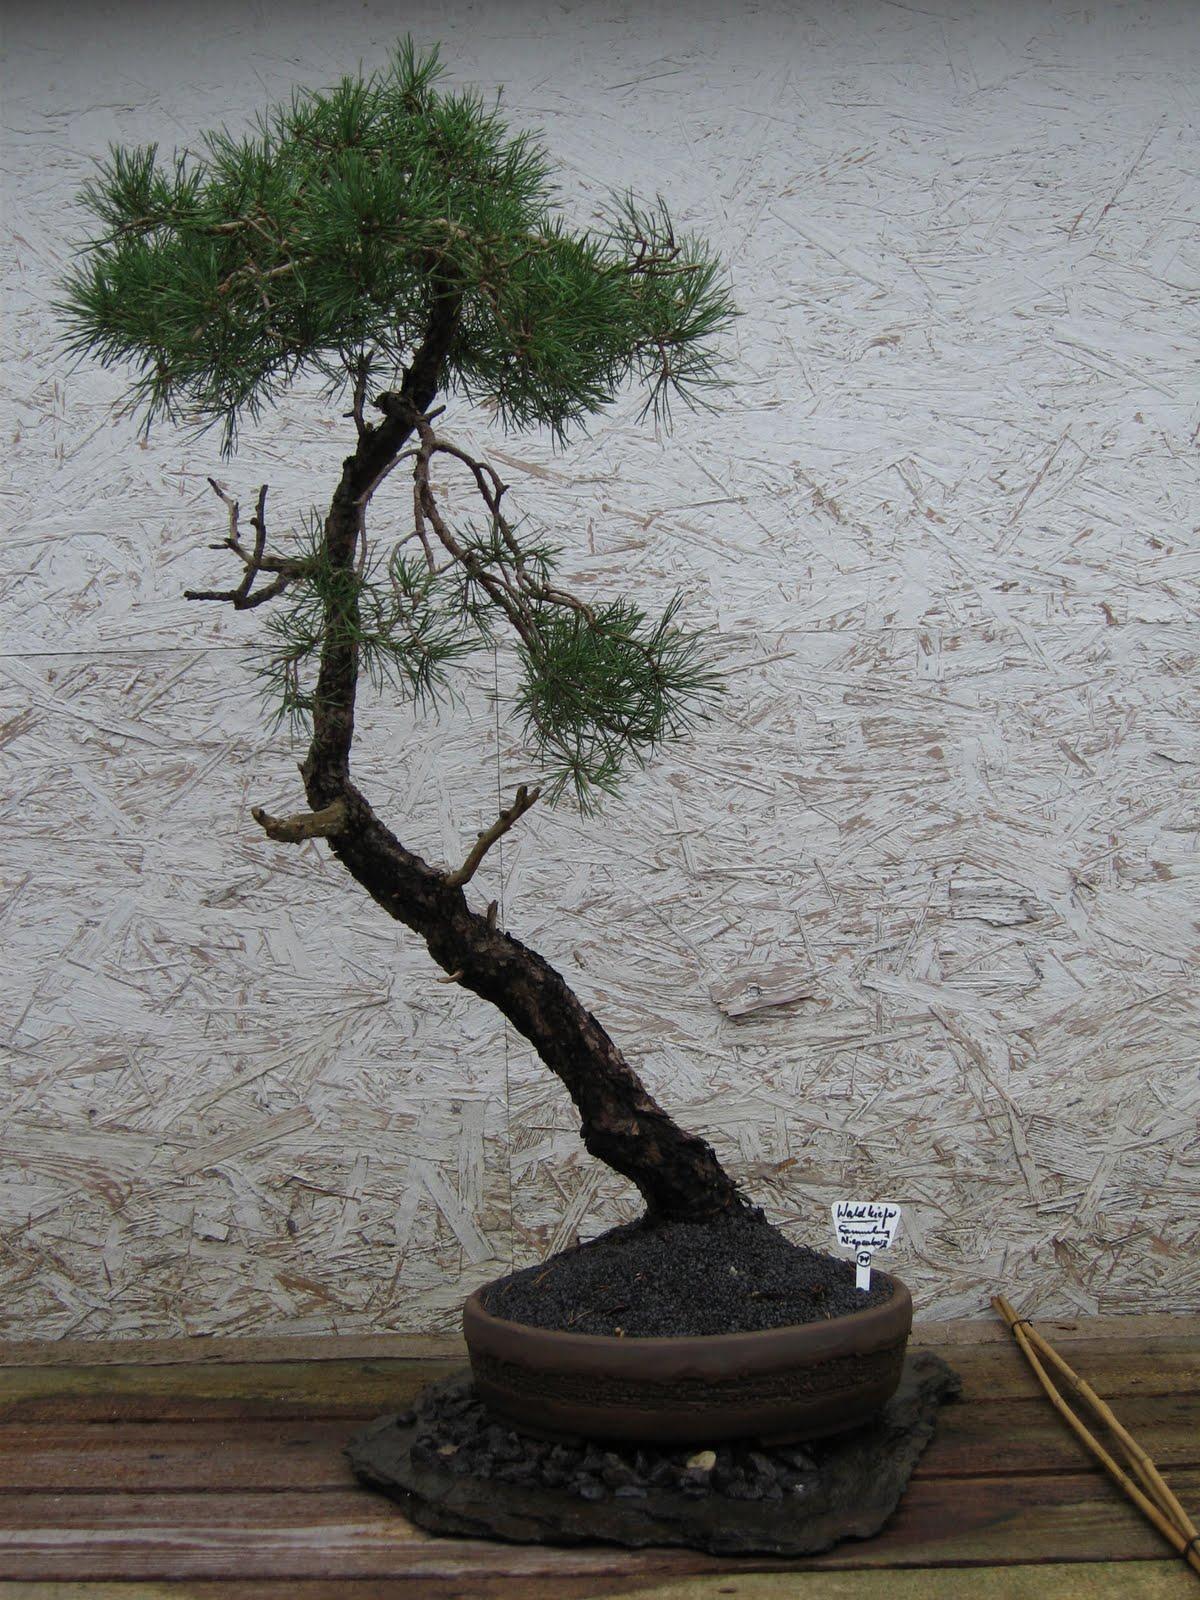 bonsai das sch nste hobby der welt bonsaiausstellung der. Black Bedroom Furniture Sets. Home Design Ideas